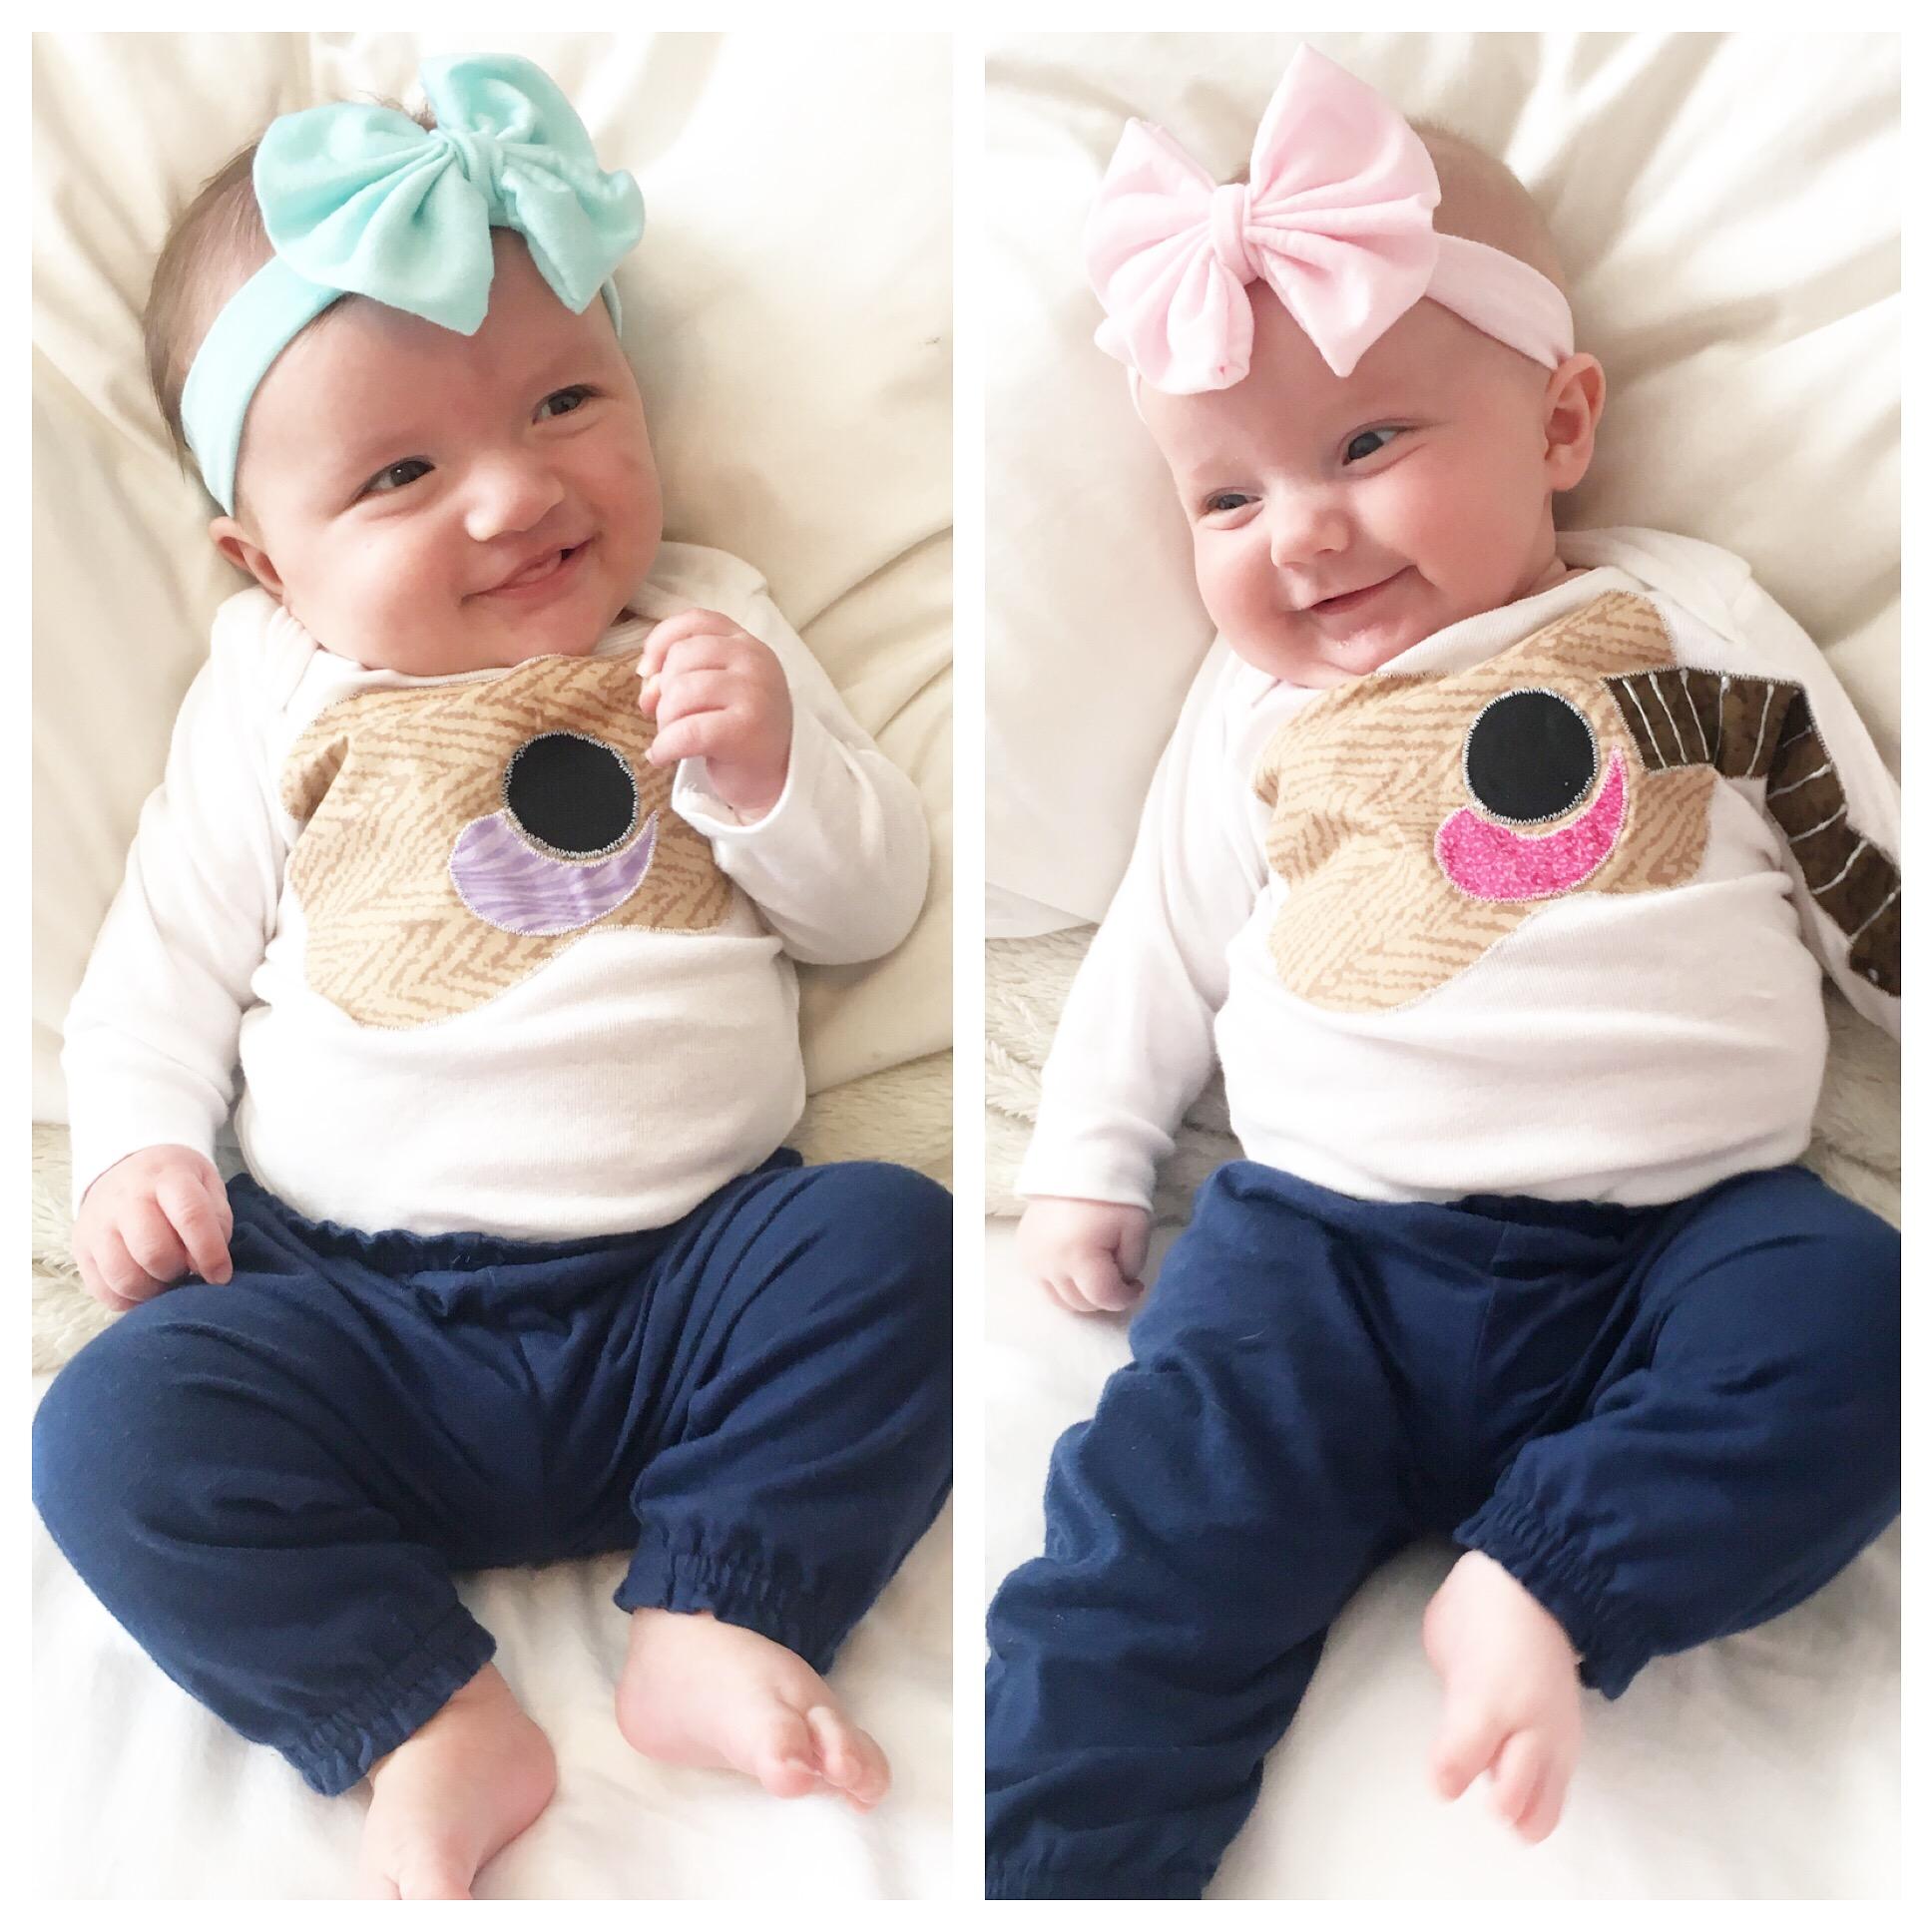 Babies Alice & Amelia at 3 months | LLU Center for Fertility